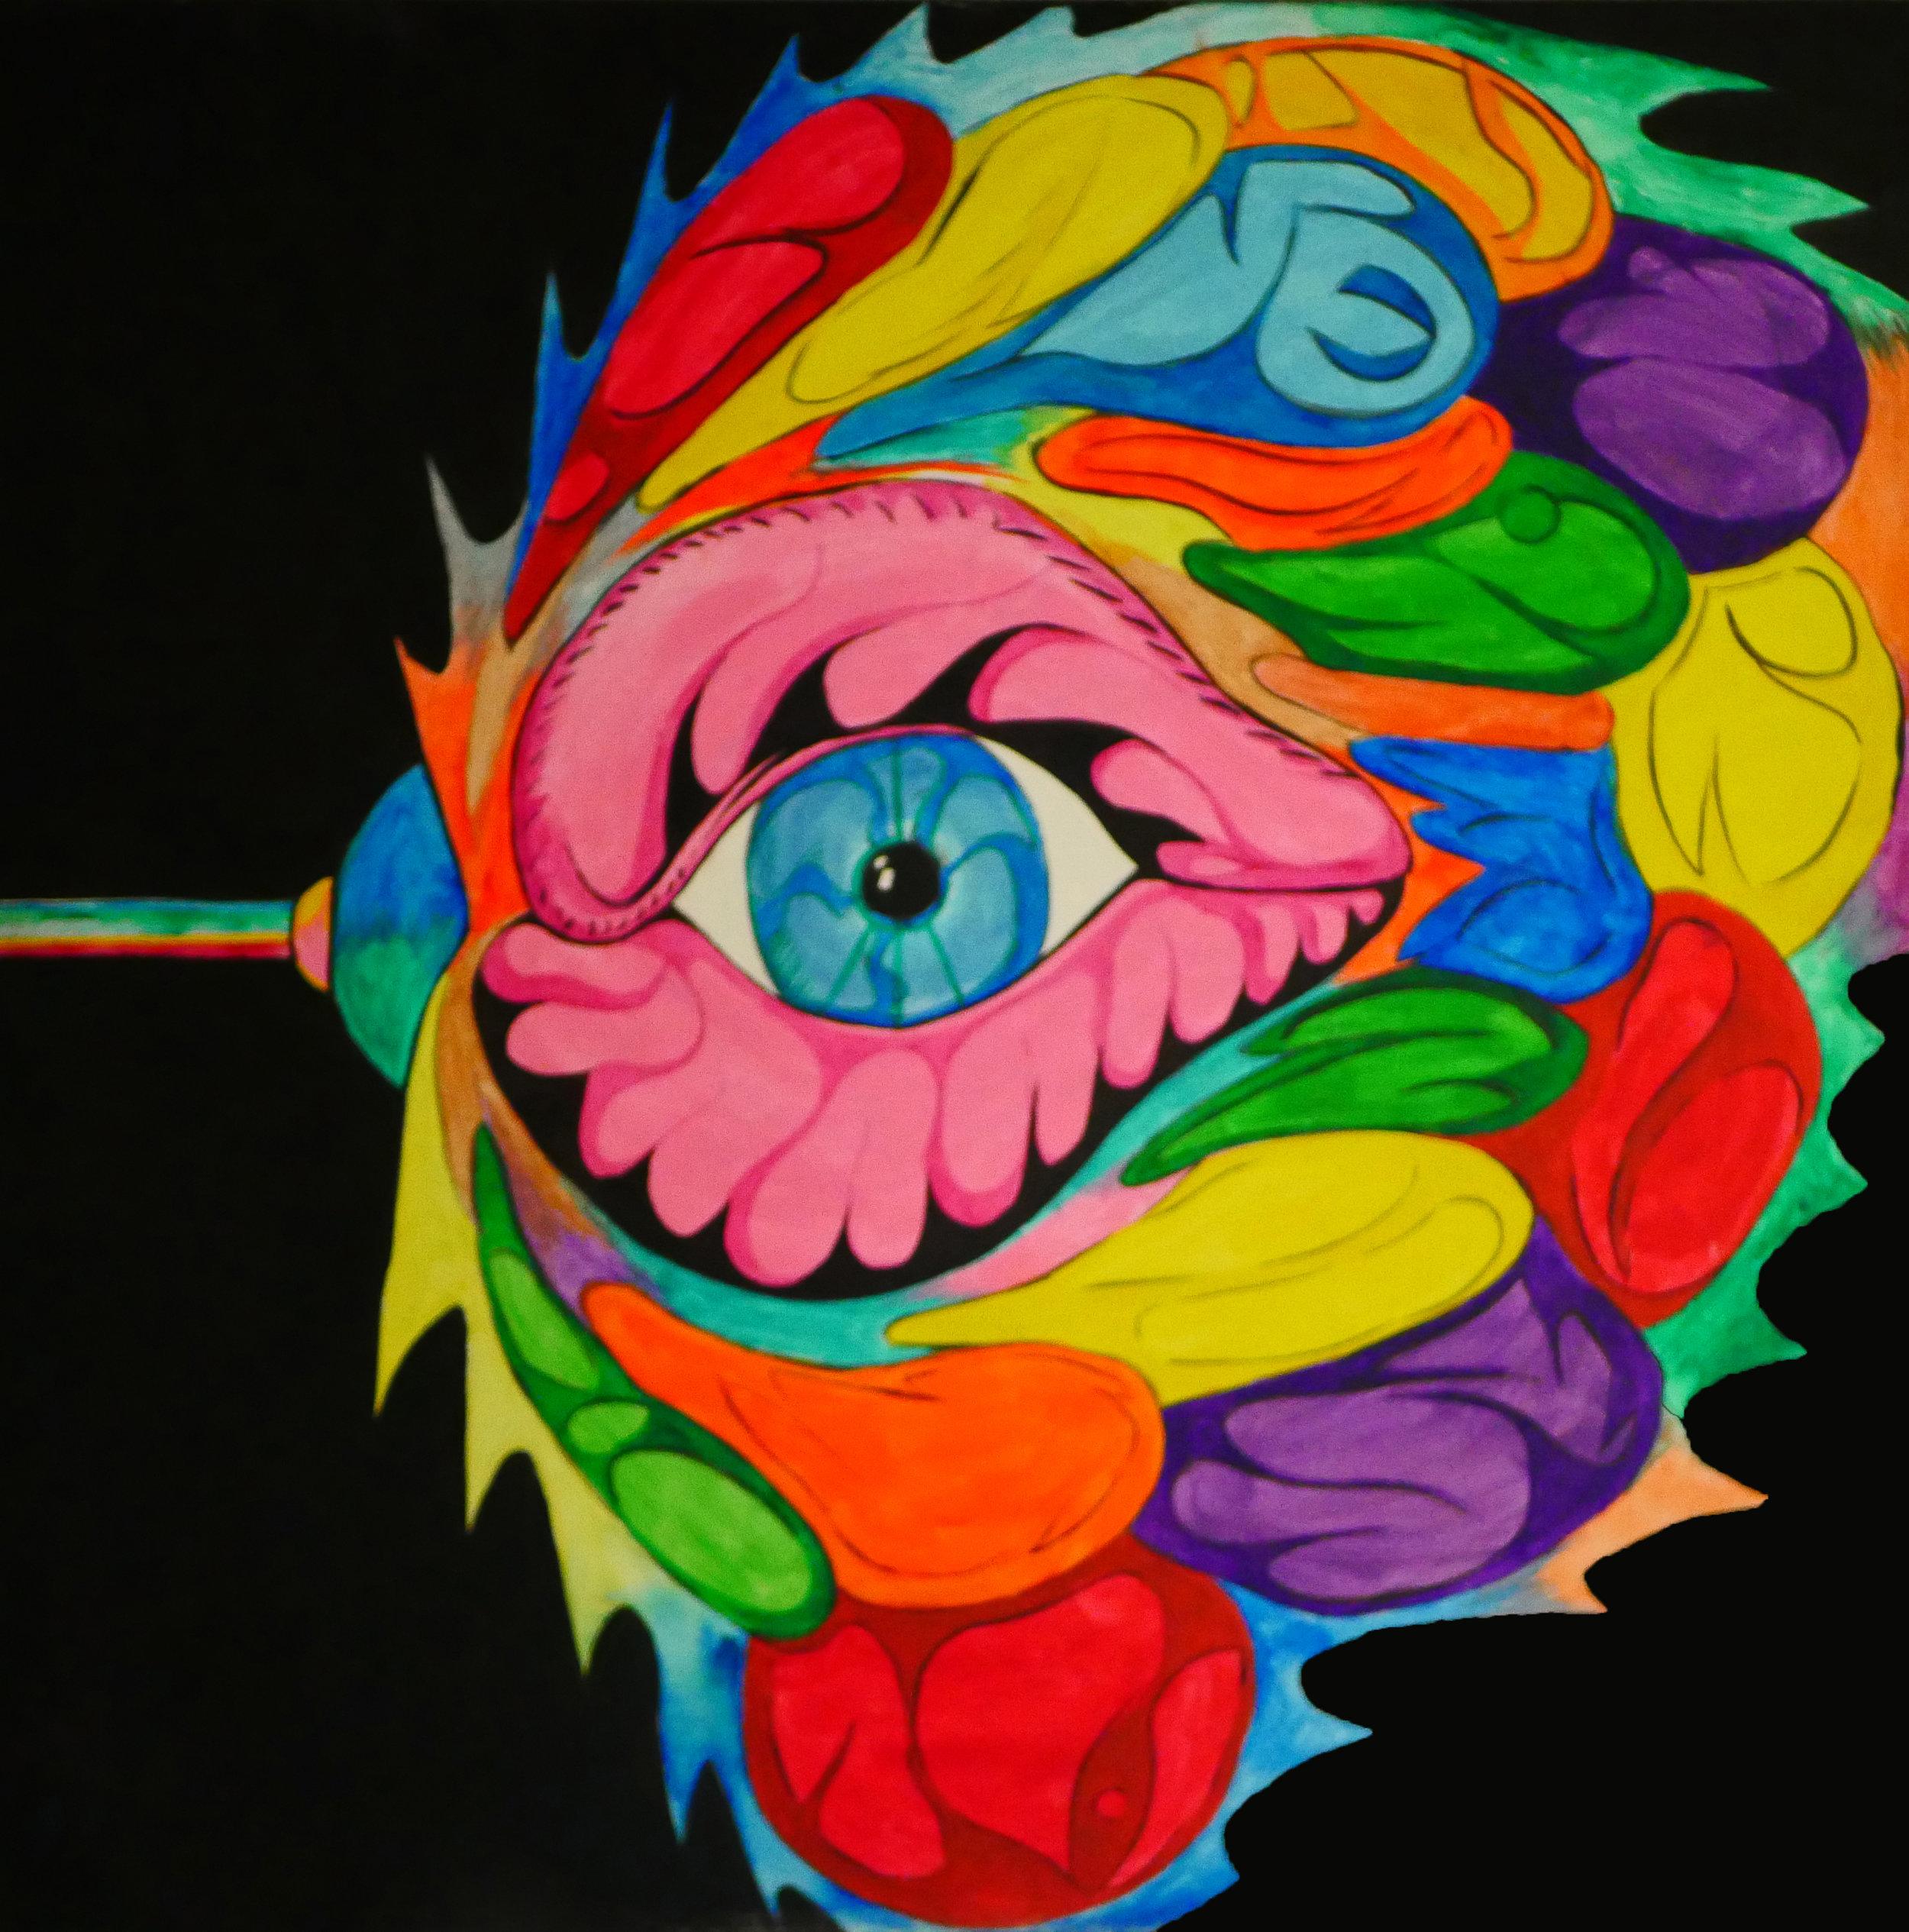 joaquin alonso- EYE- Acrylic on canvas- 24x24- 2016- $1300.jpg